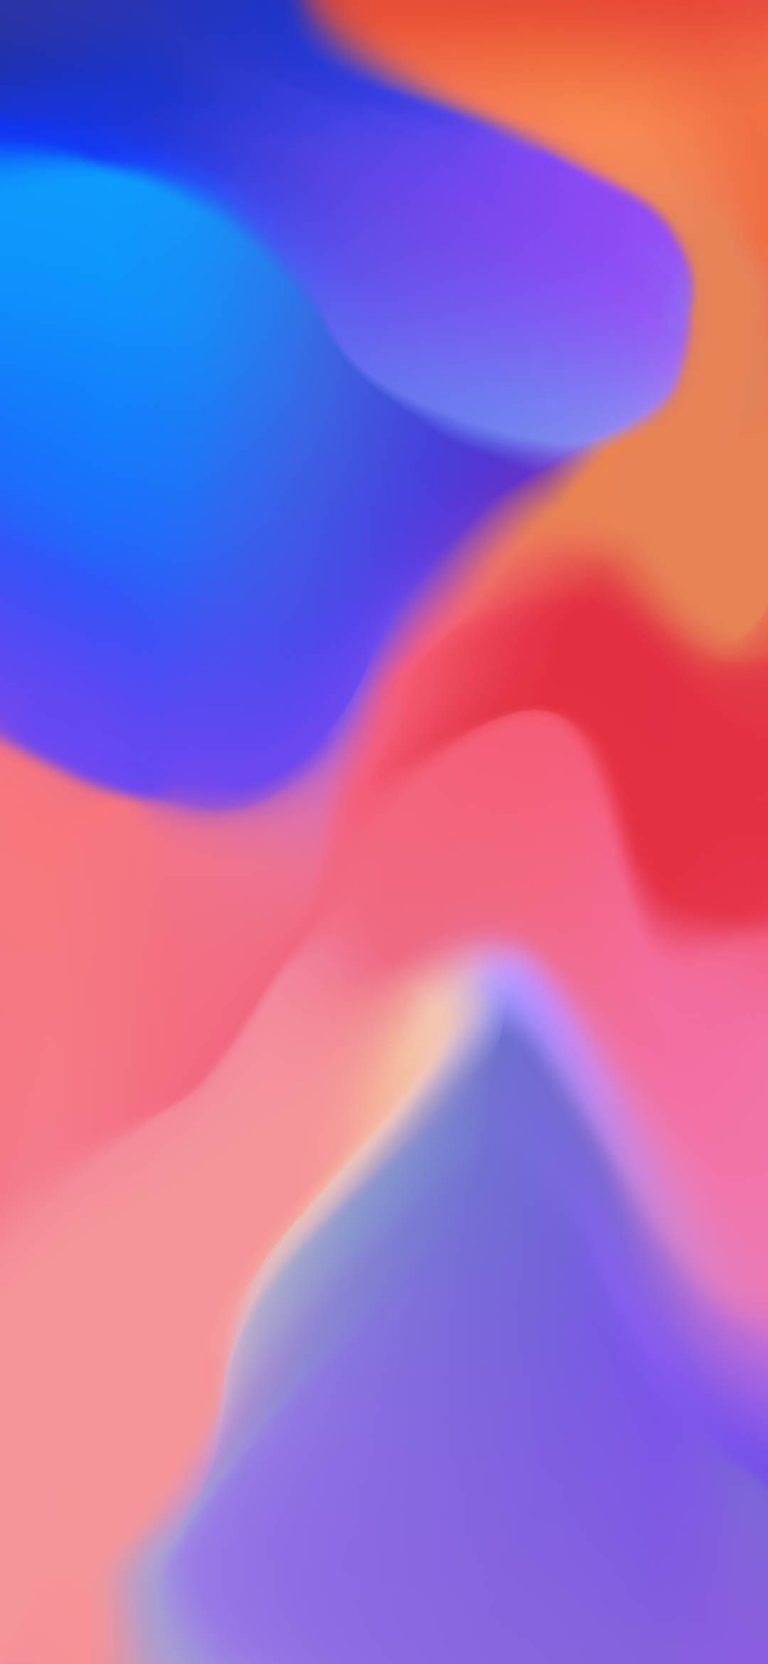 ZTE Nubia Red Magic 3 Stock Wallpaper 08 1080x2340 768x1664